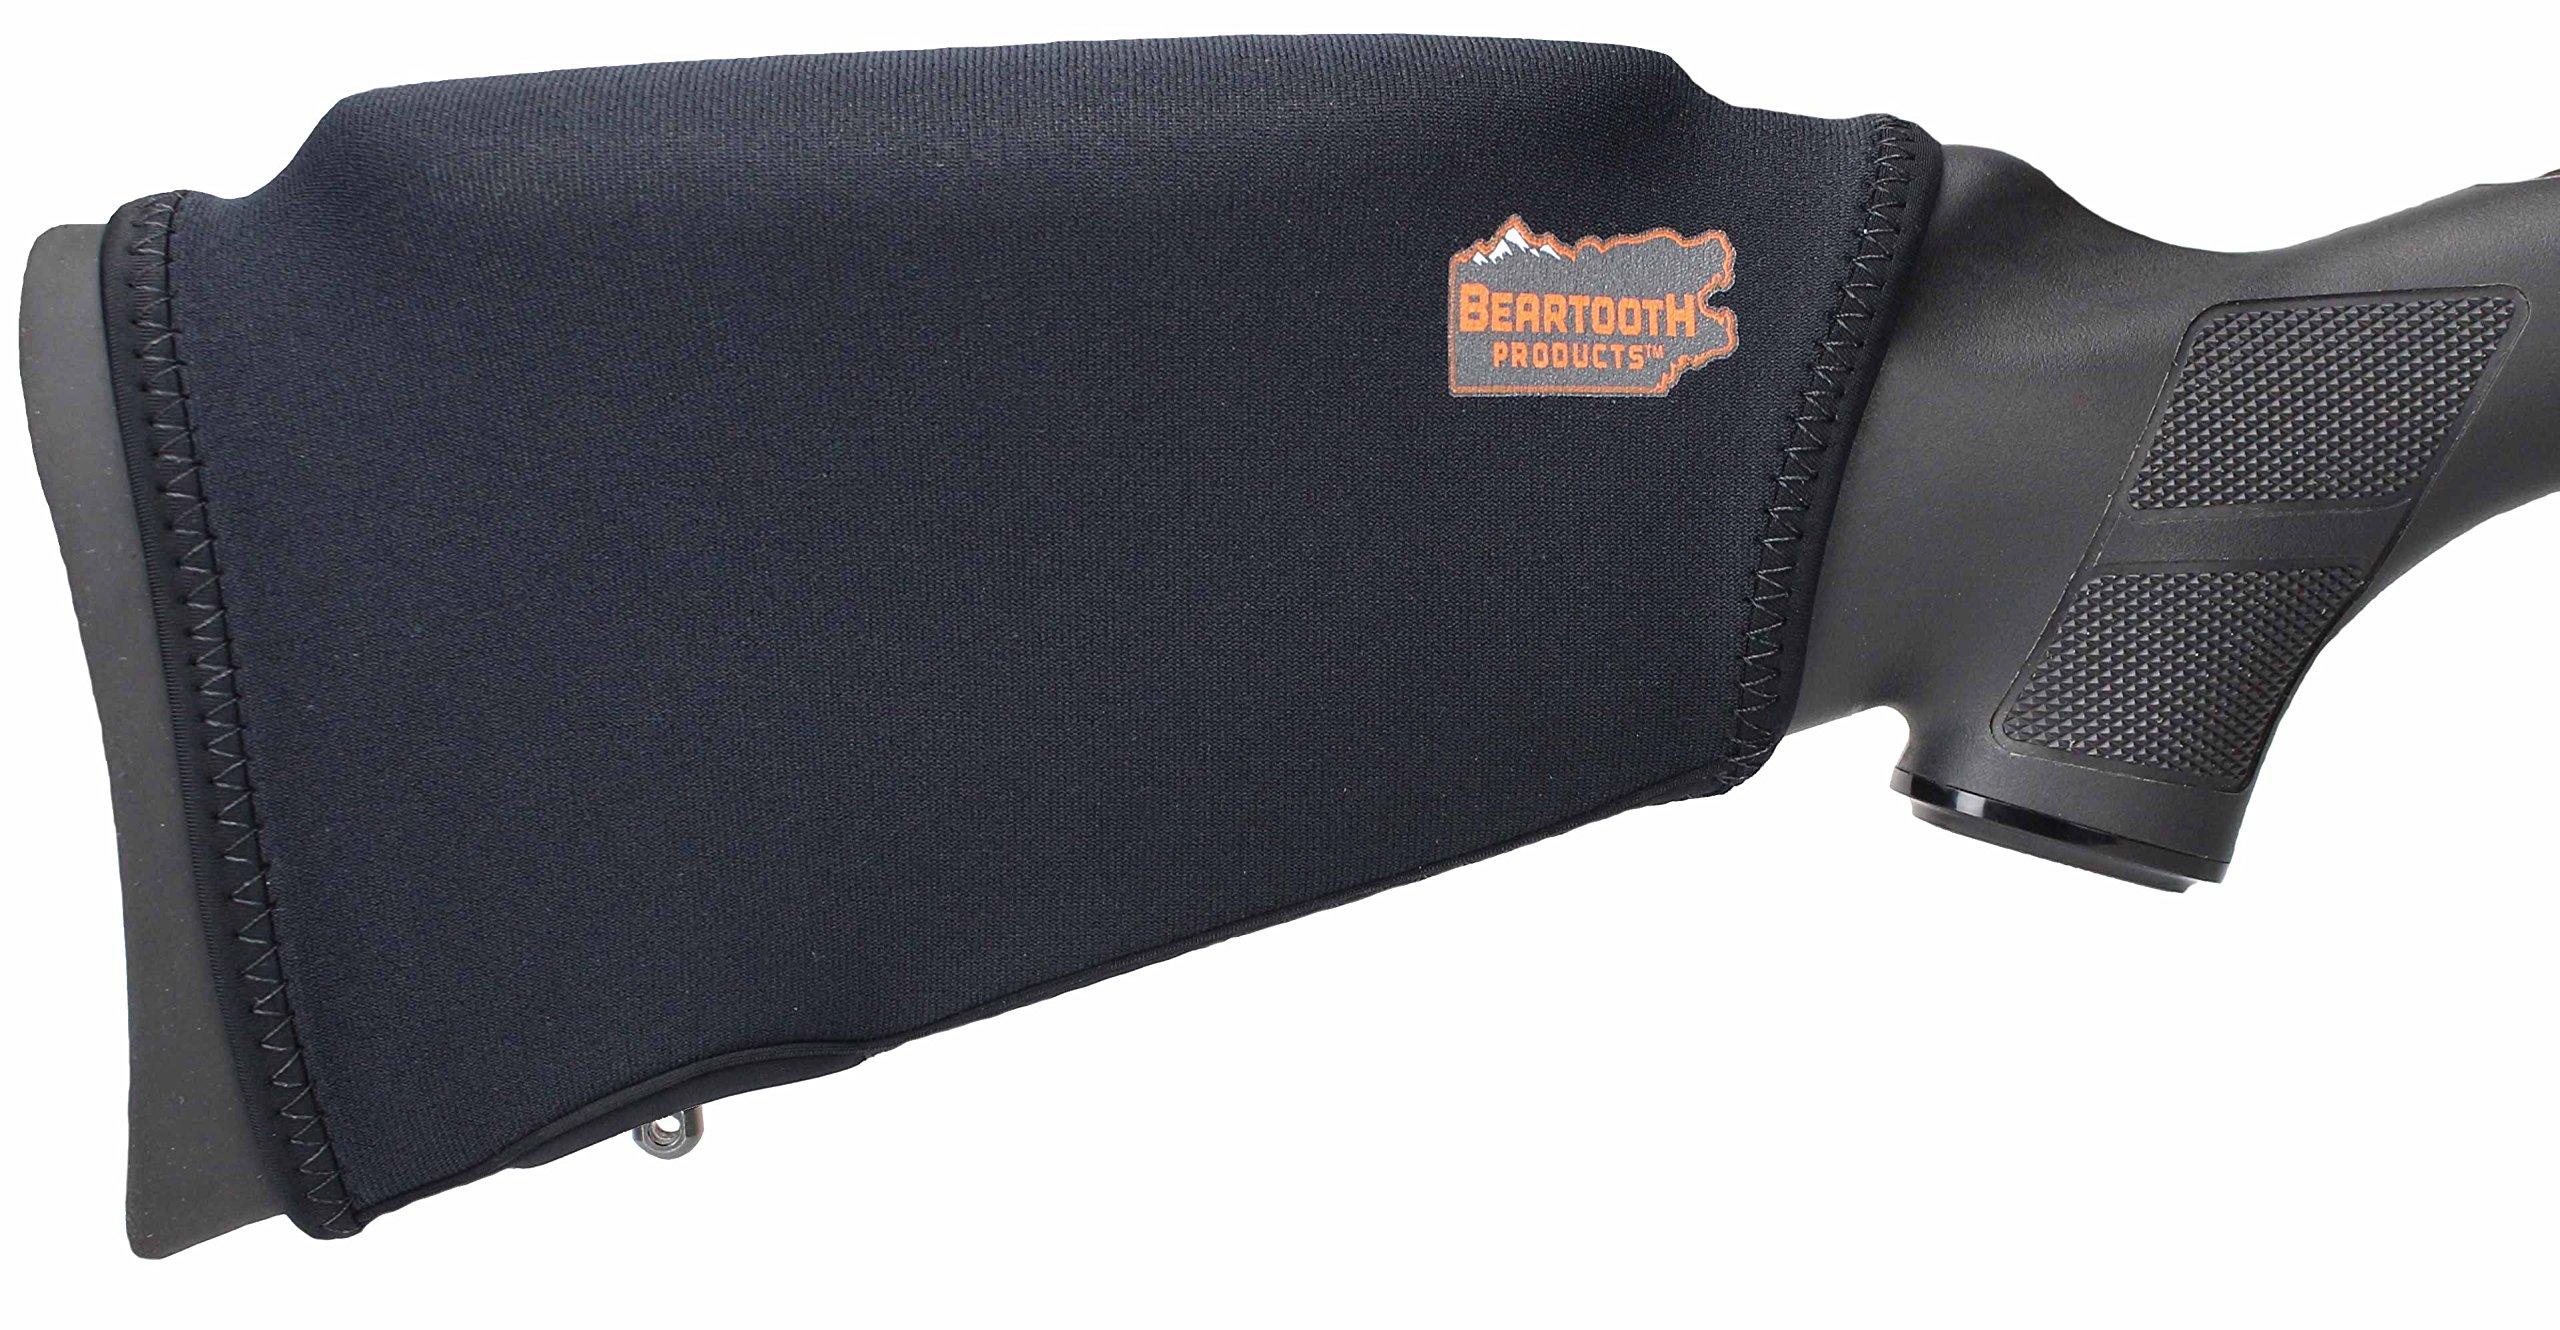 Beartooth Comb Raising Kit 2.0 - Premium Neoprene Gun Stock Cover + (5) Hi-density Foam Inserts - NO LOOPS MODEL (Black)